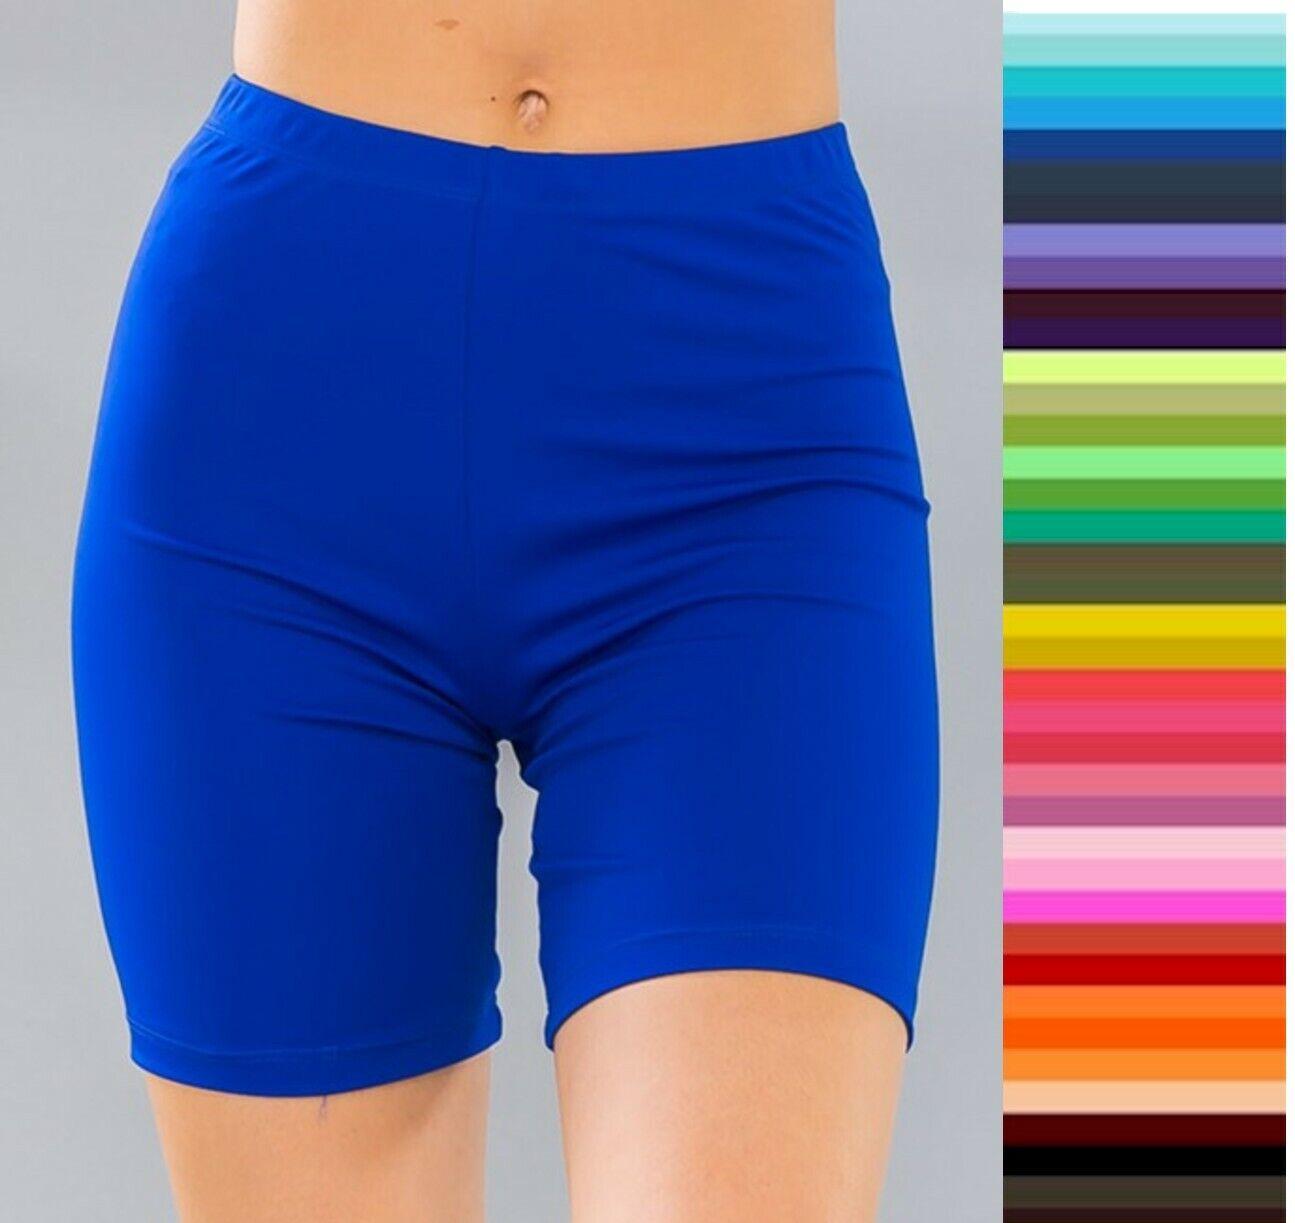 Bike Shorts Longer Length Mid Thigh Spandex Stretch S M L 10